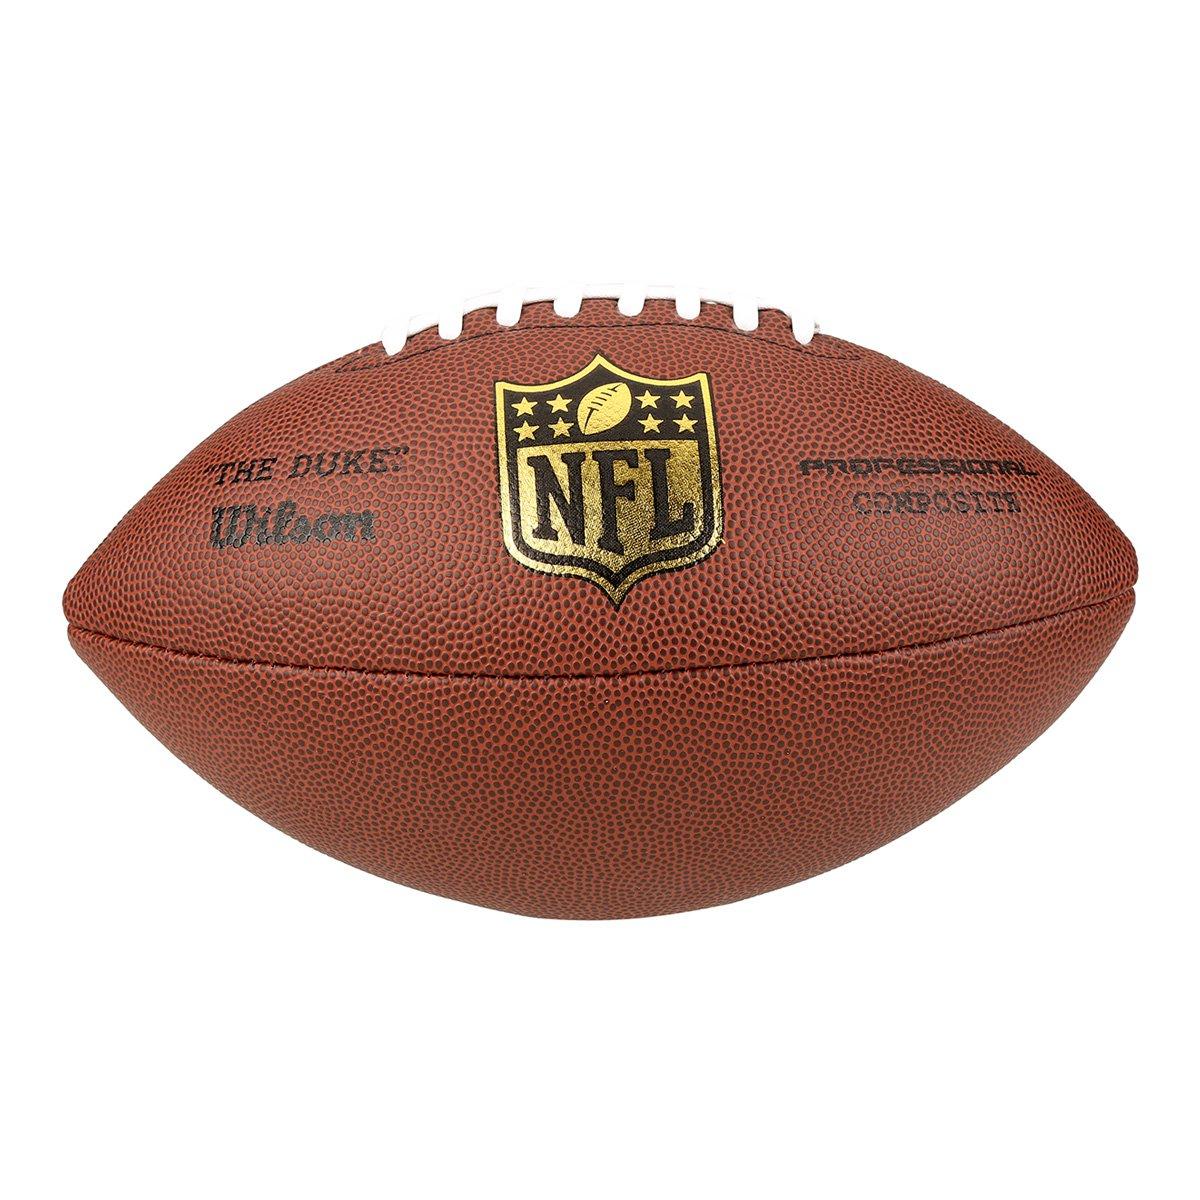 Bola Futebol Americano Wilson NFL Duke Réplica - Marrom